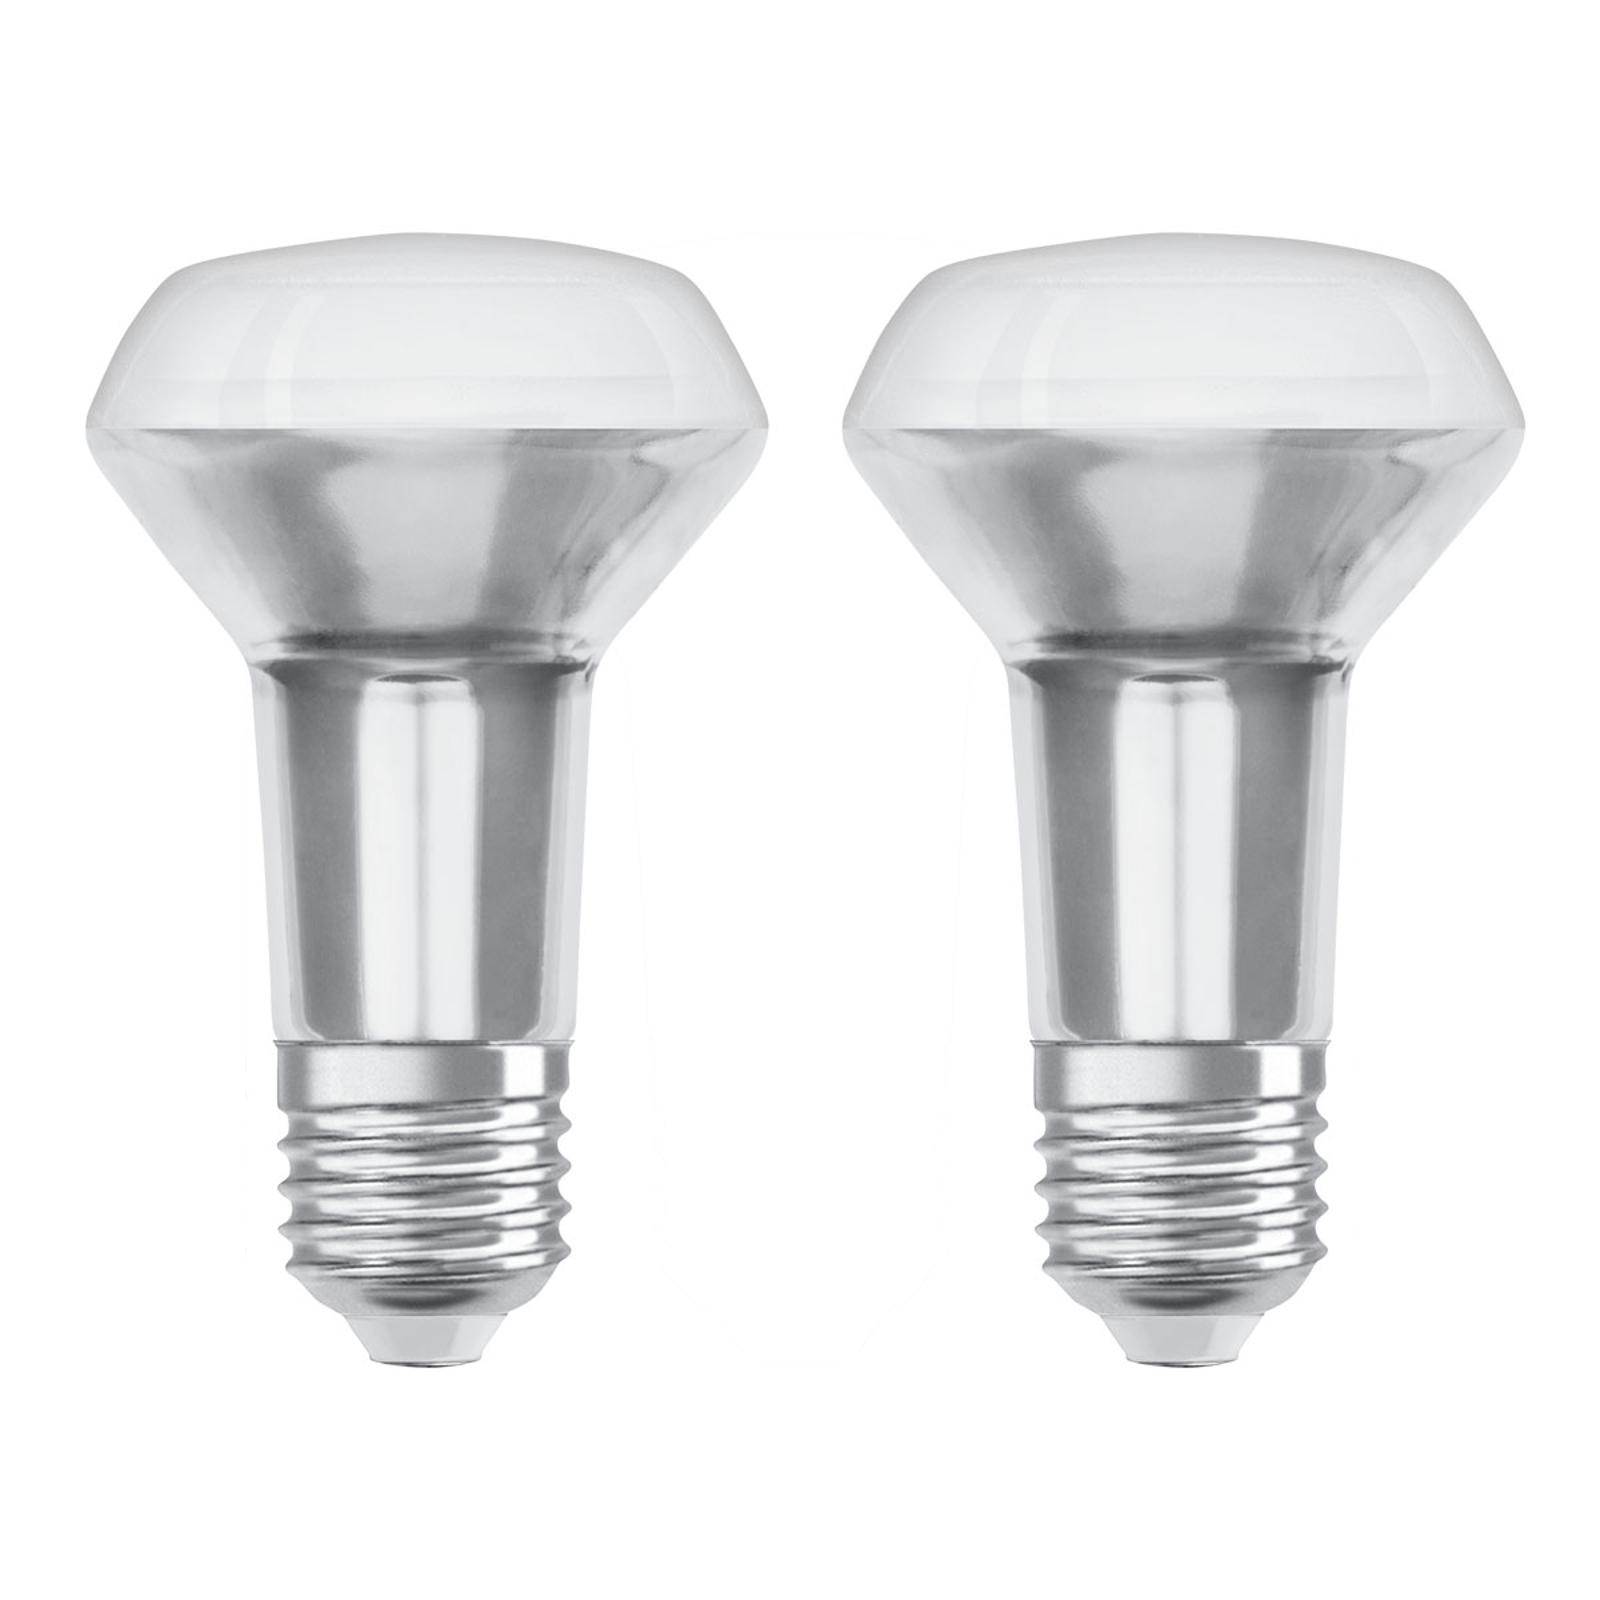 OSRAM reflektor LED E27 R63 4,3W 2700K 36° 2szt.